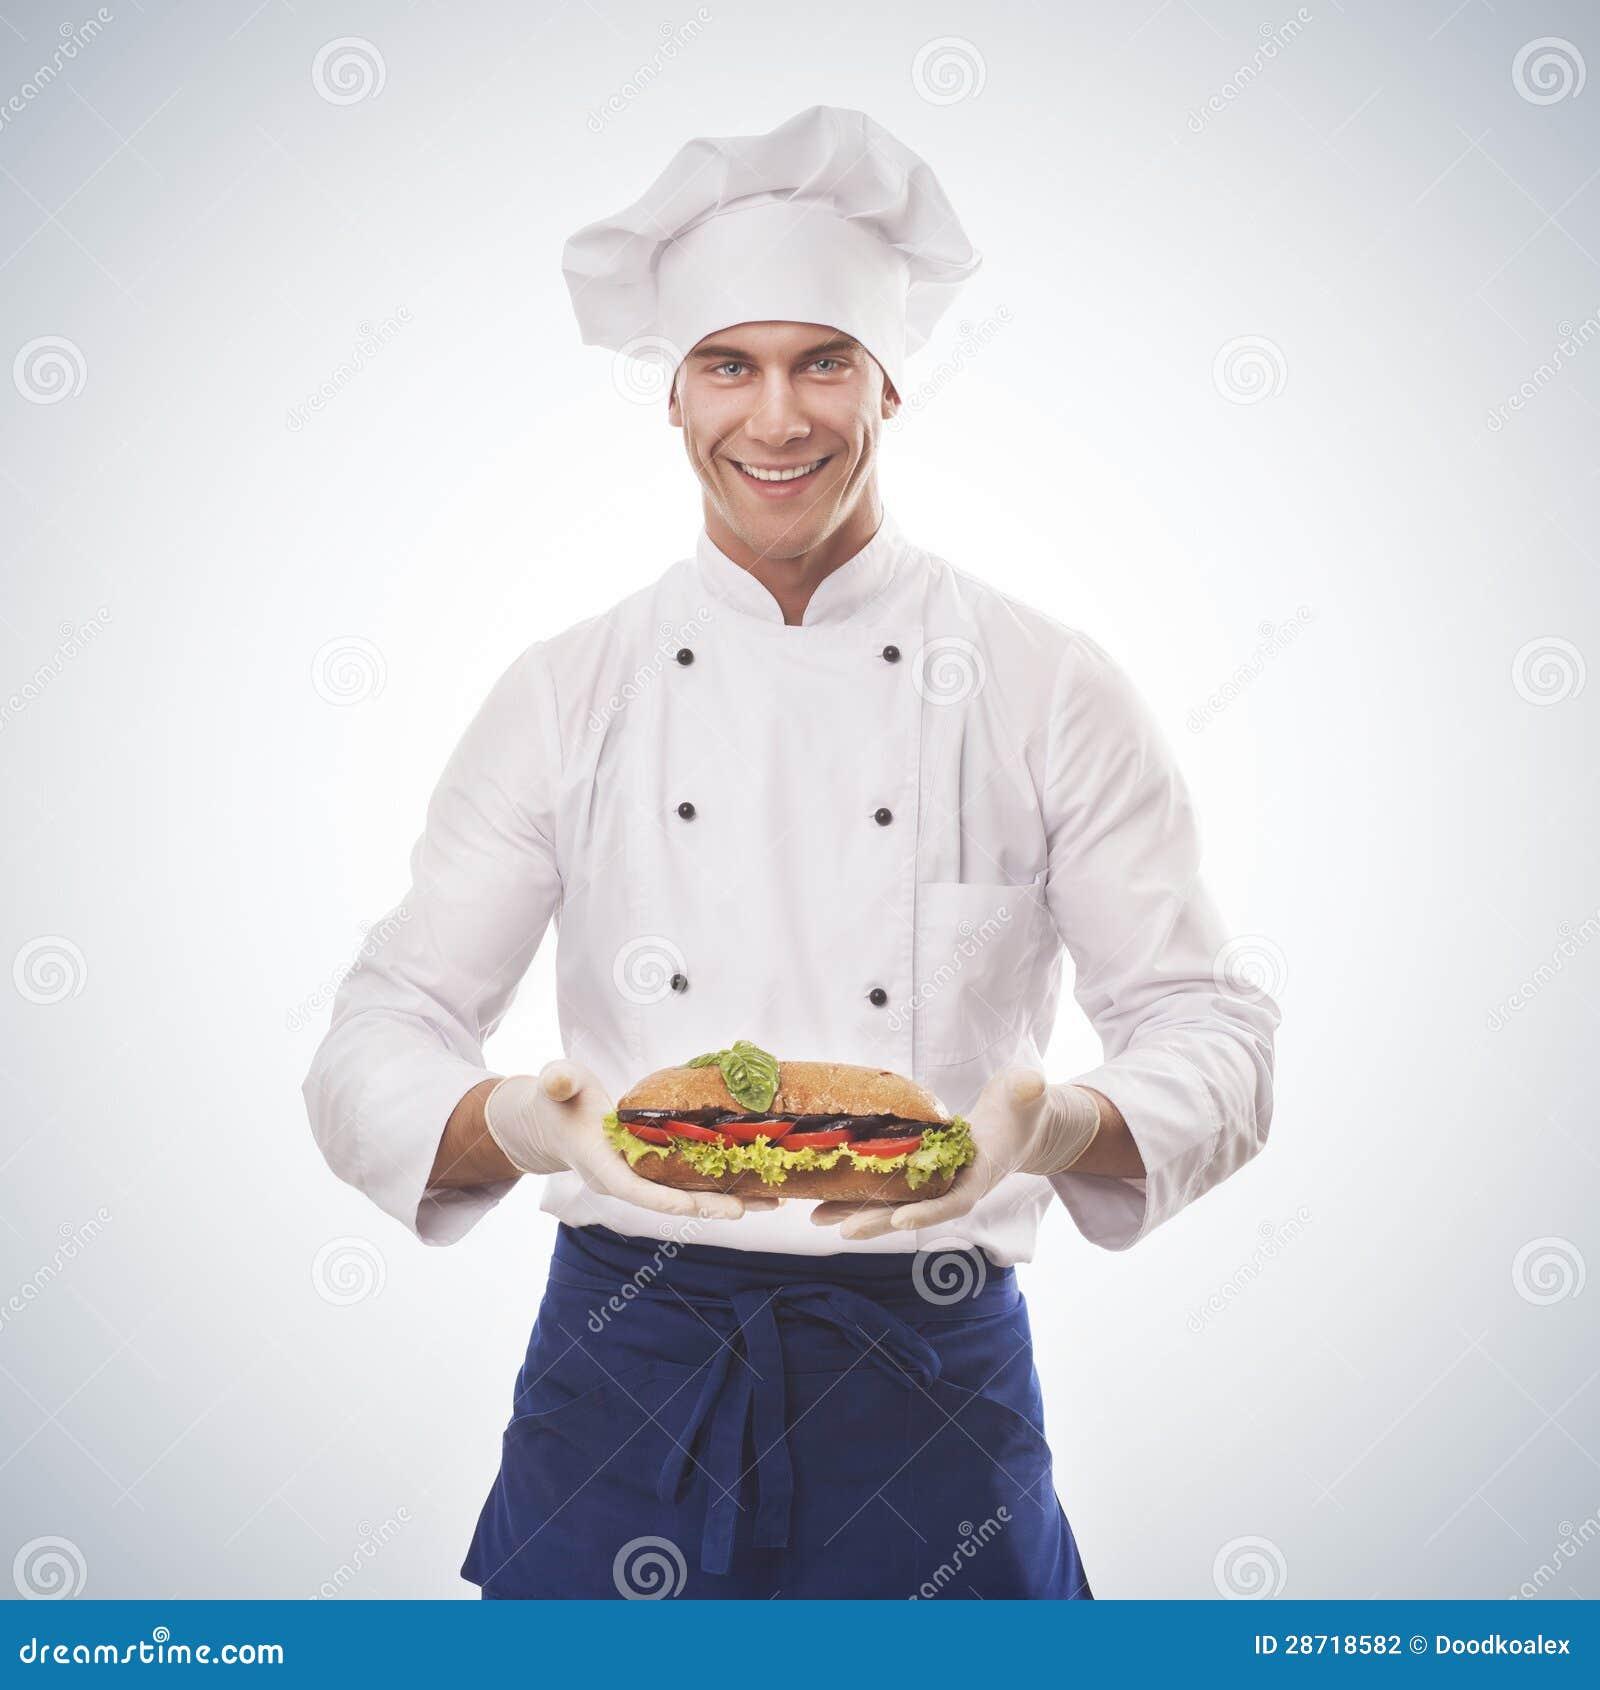 Chef holding a big sandwich